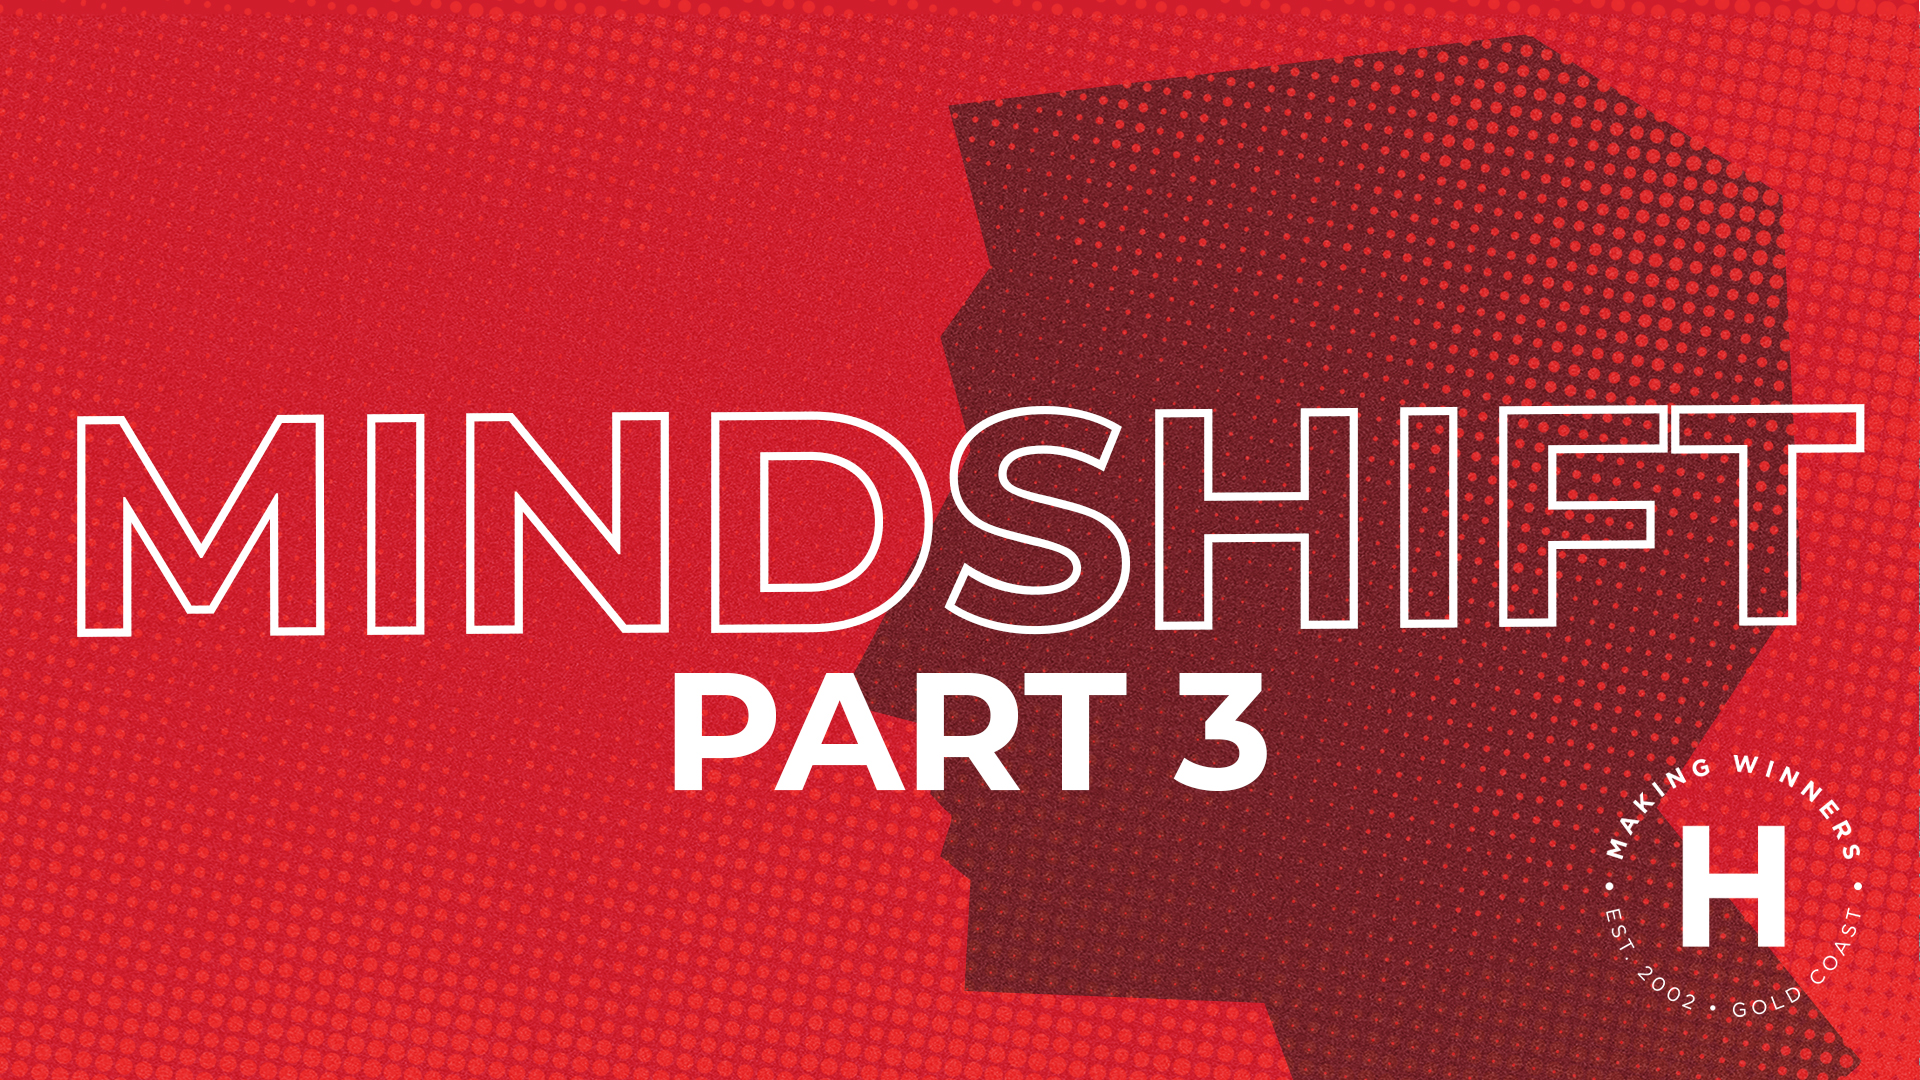 Mindshift: part 3